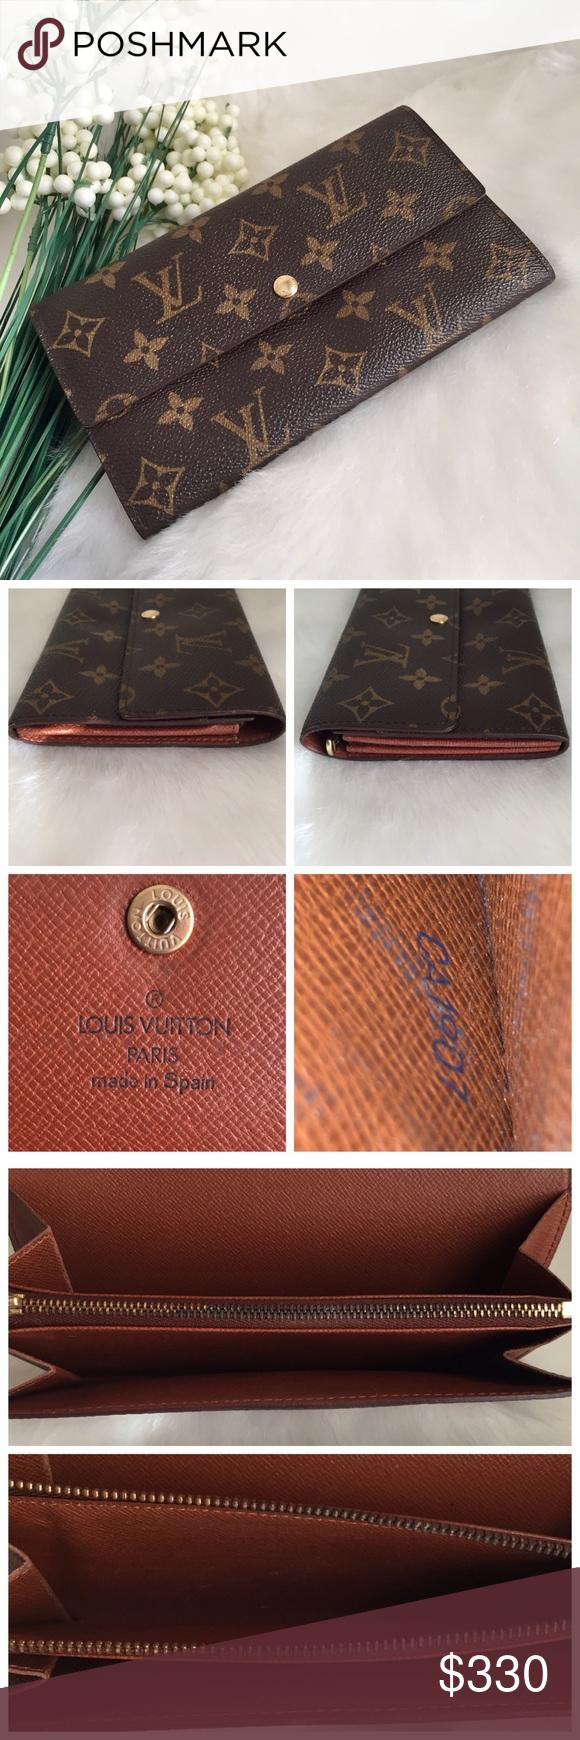 Louis Vuitton Porte Monnaie Long Bifold Wallet